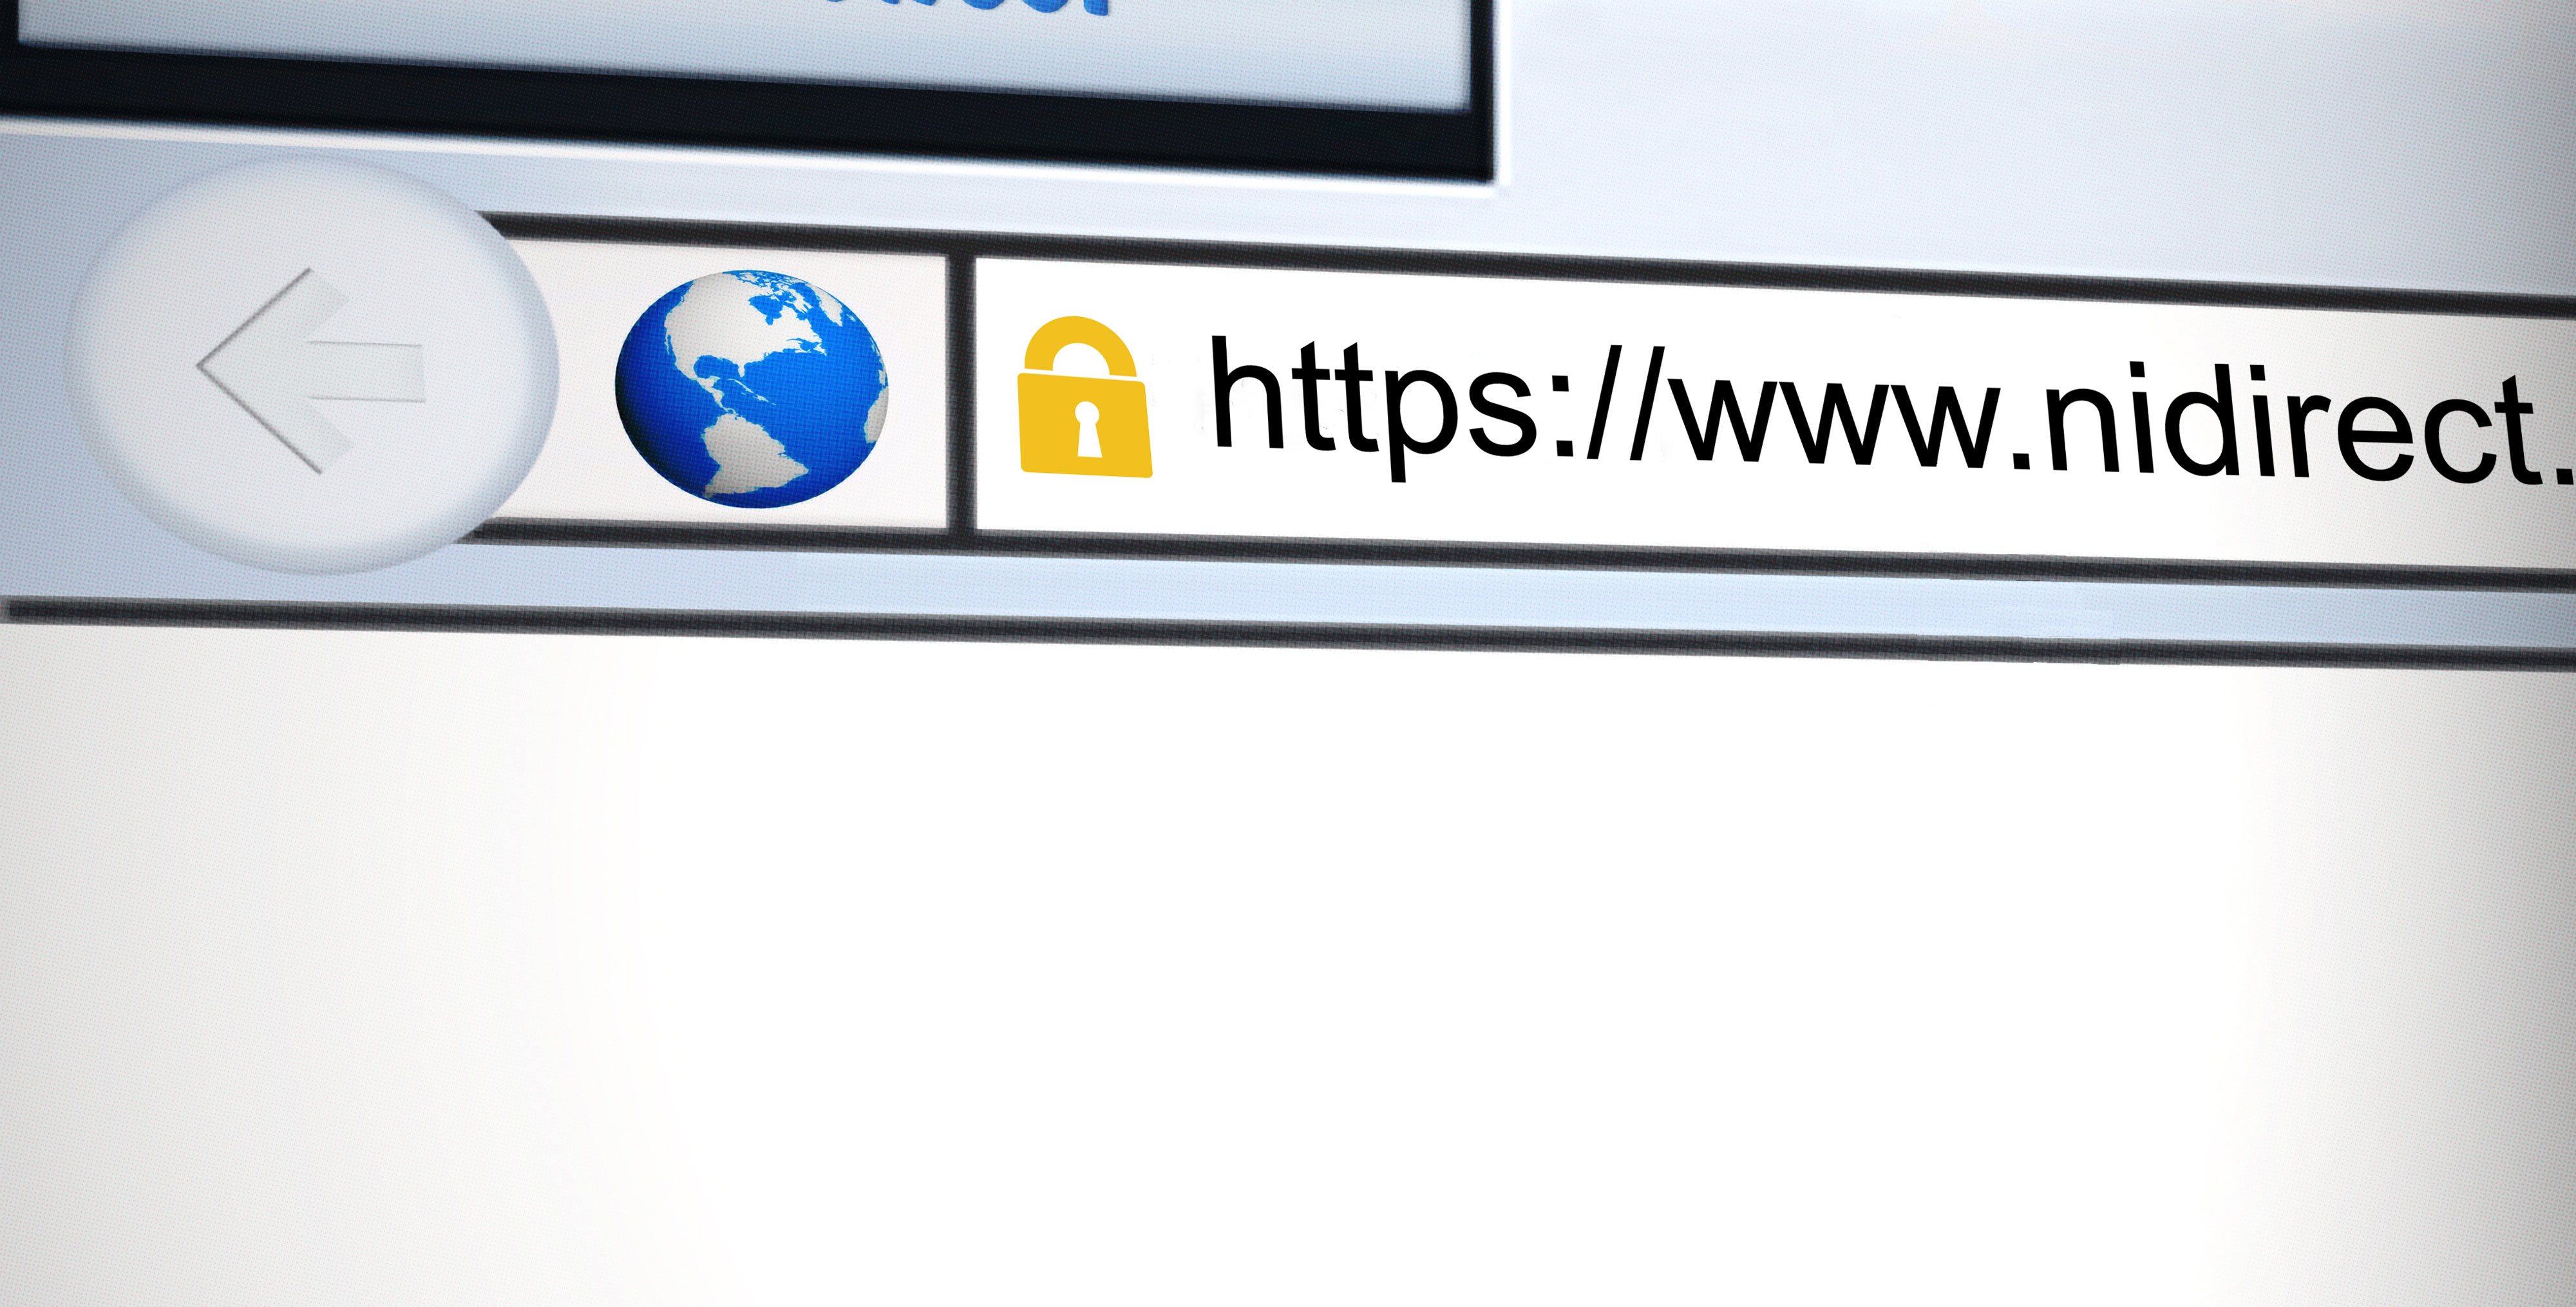 web browser image